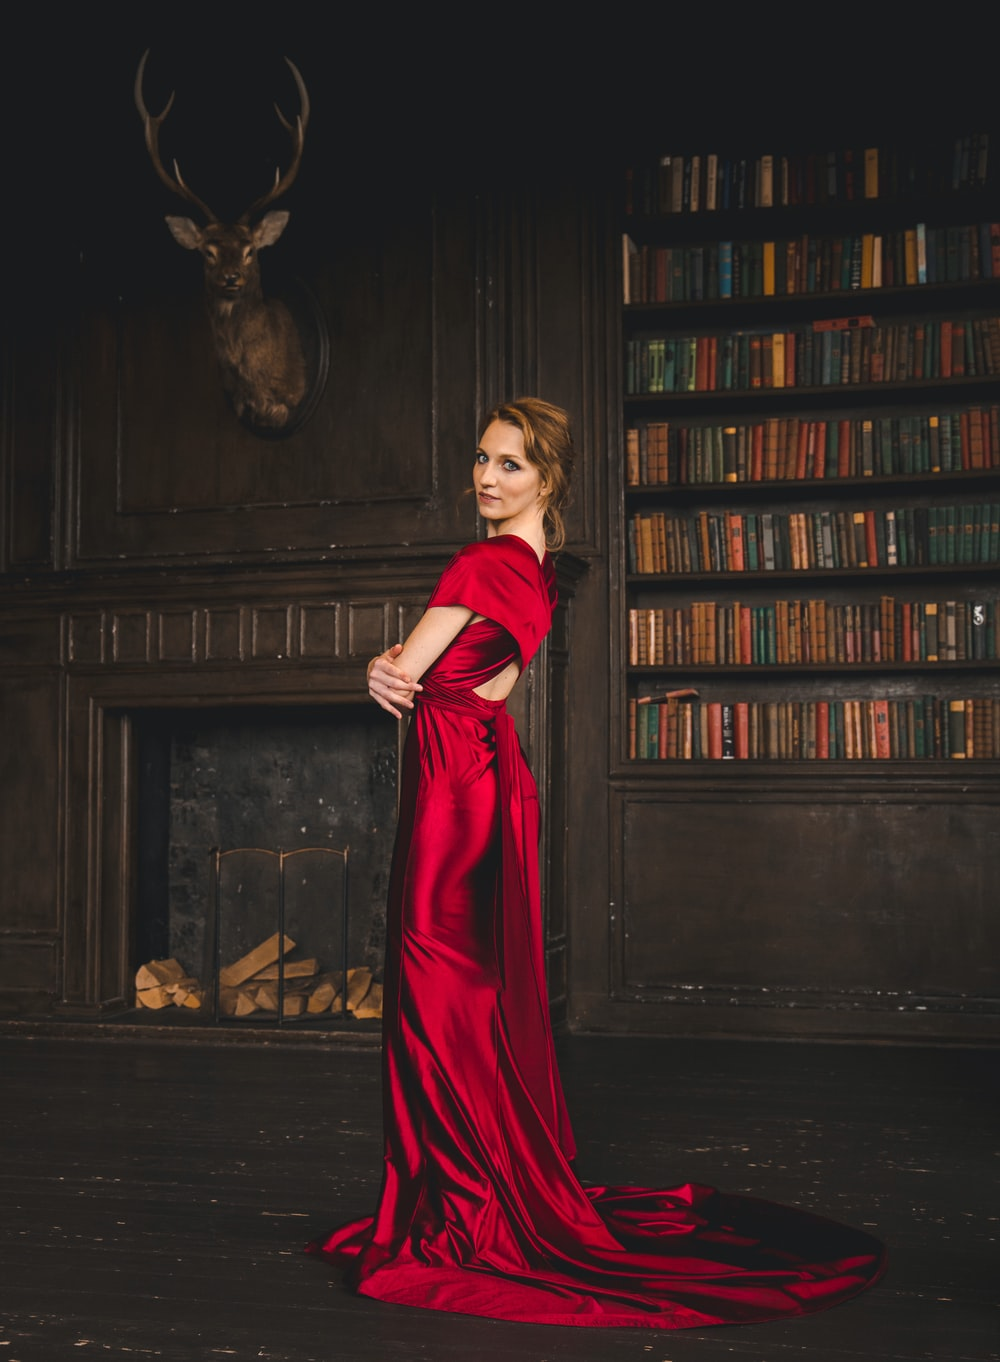 woman in red long sleeve dress standing beside brown wooden book shelf